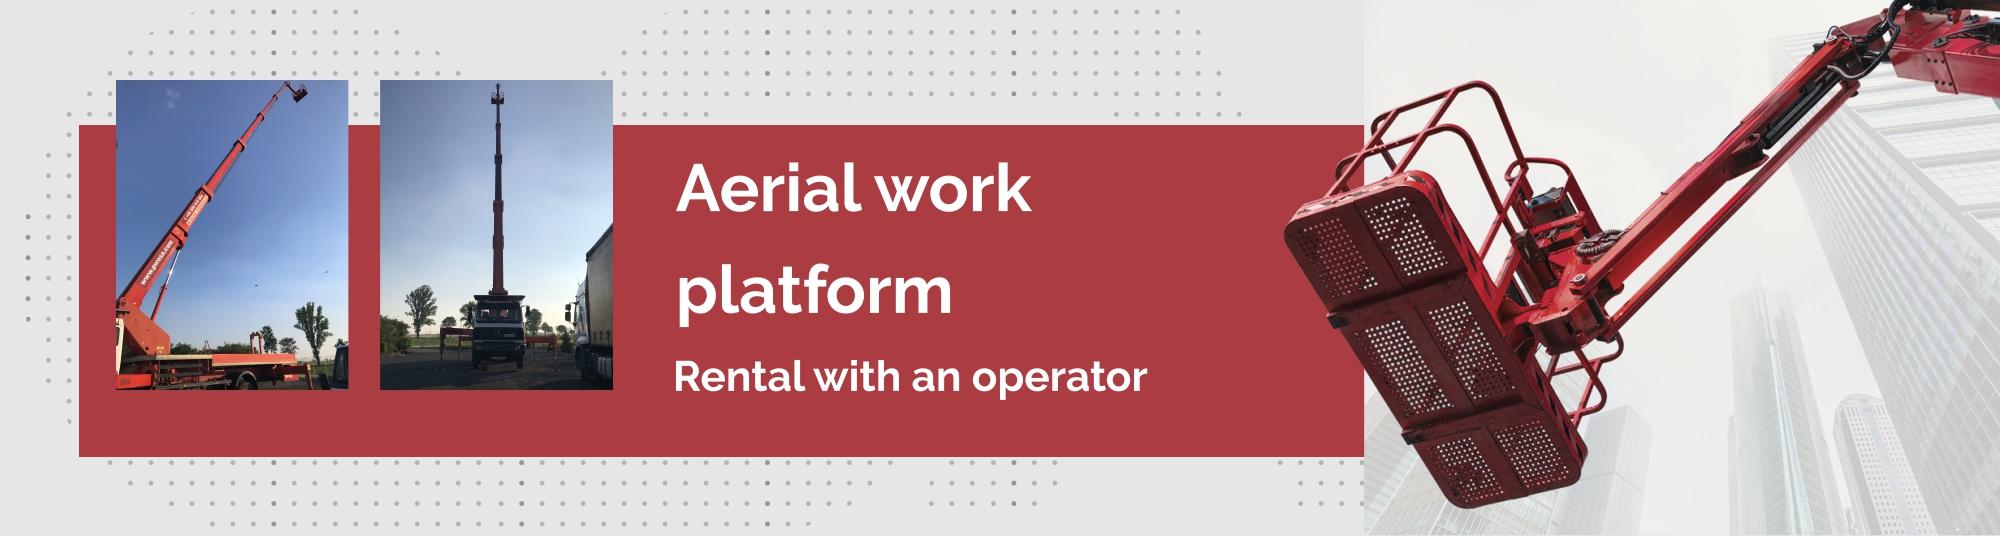 Aerial work platform rental